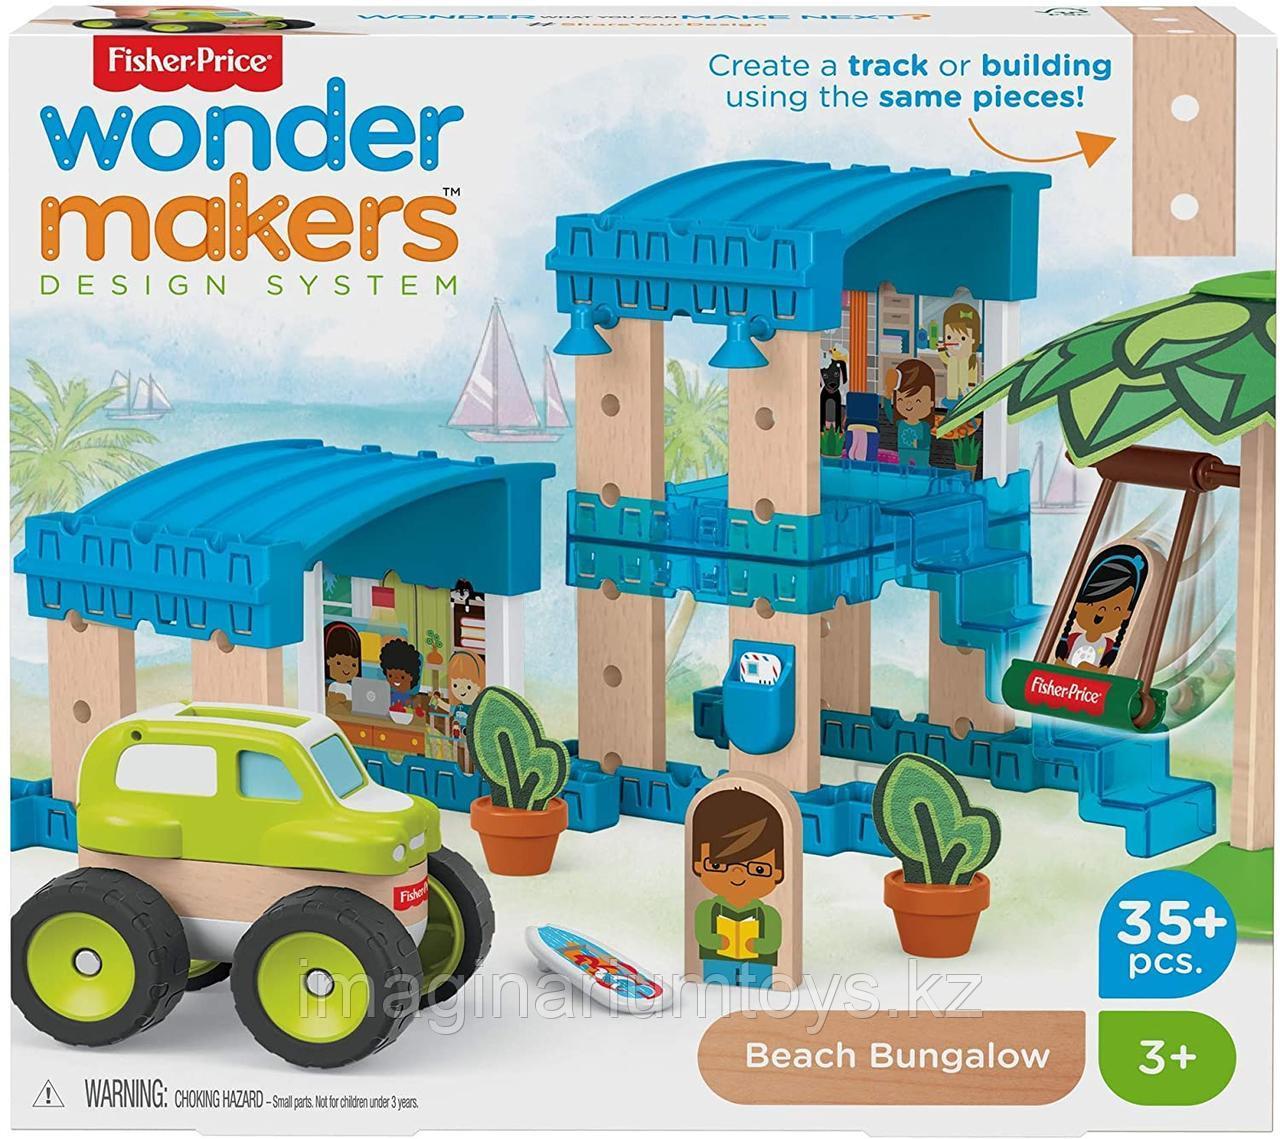 Конструктор Fisher-Price Wonder Makers для детей «Бунгало на пляже»